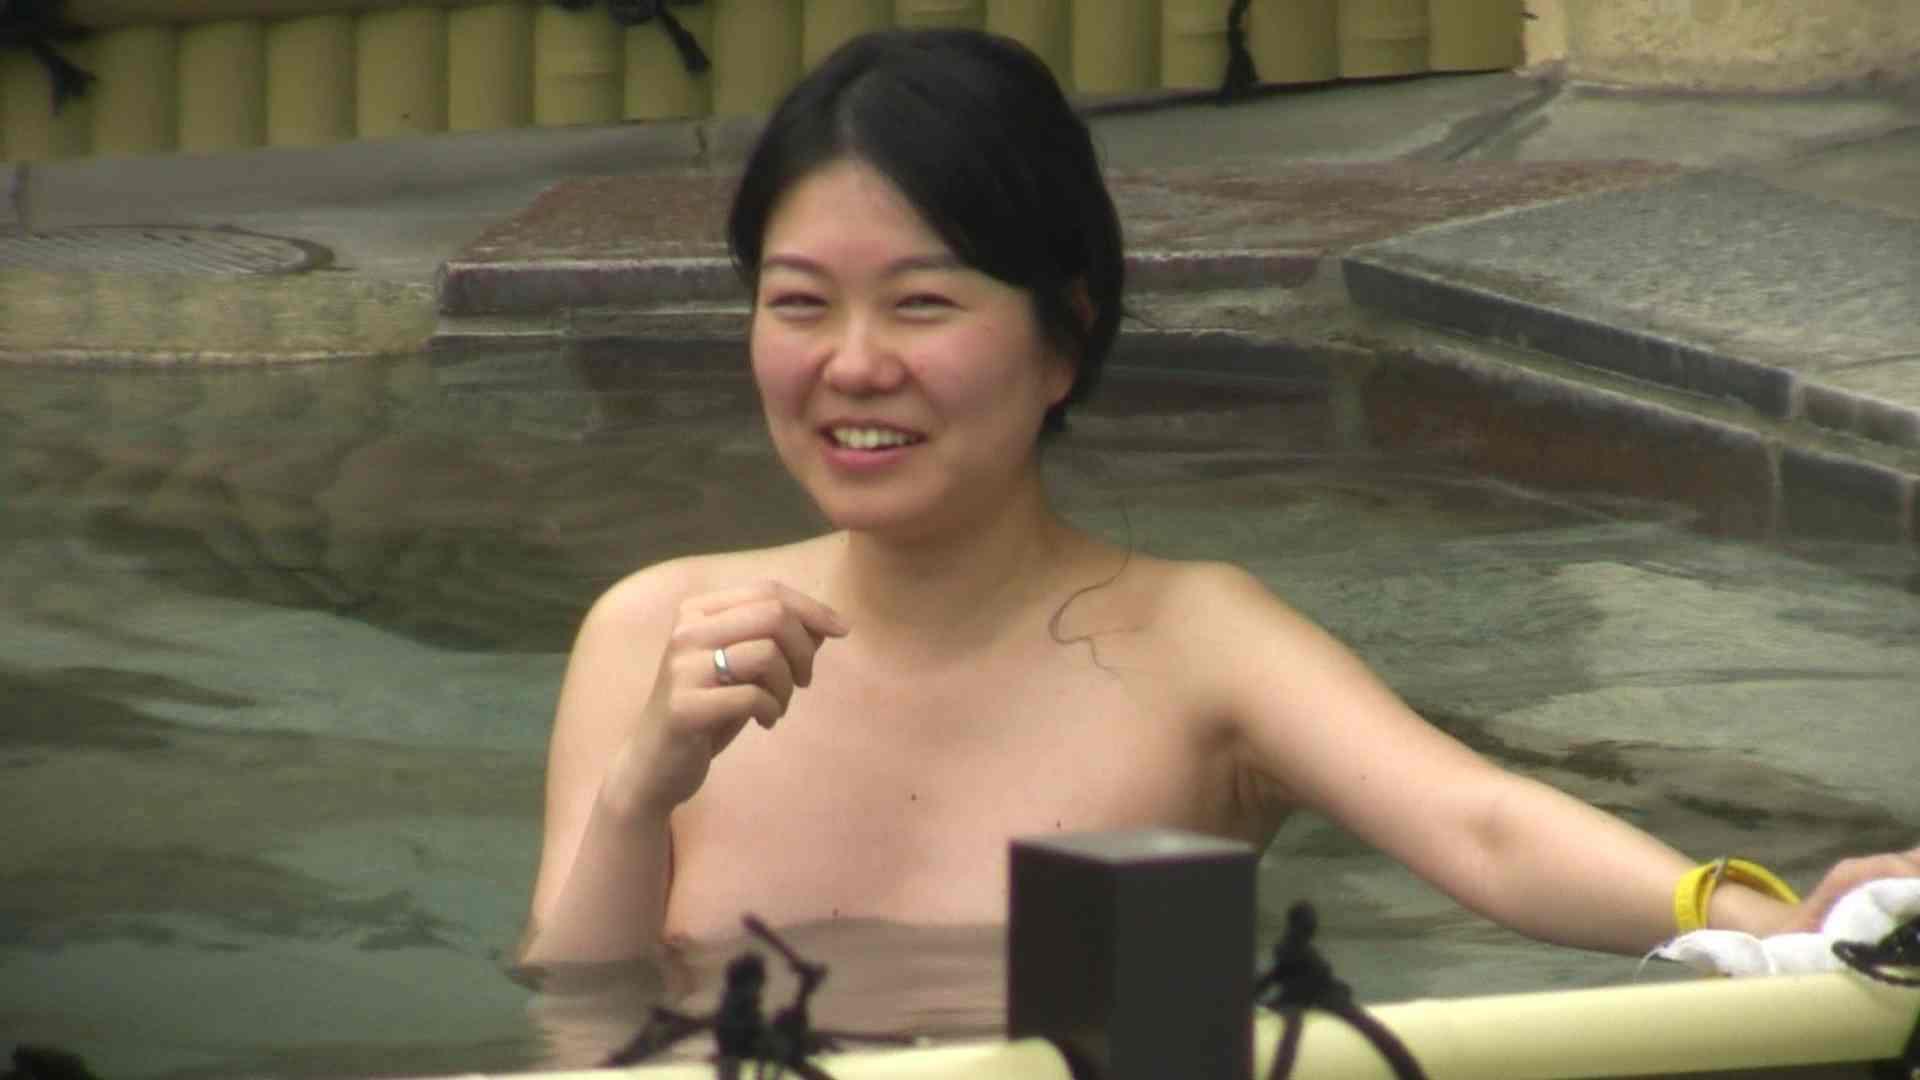 Aquaな露天風呂Vol.675 露天 オマンコ動画キャプチャ 77画像 2